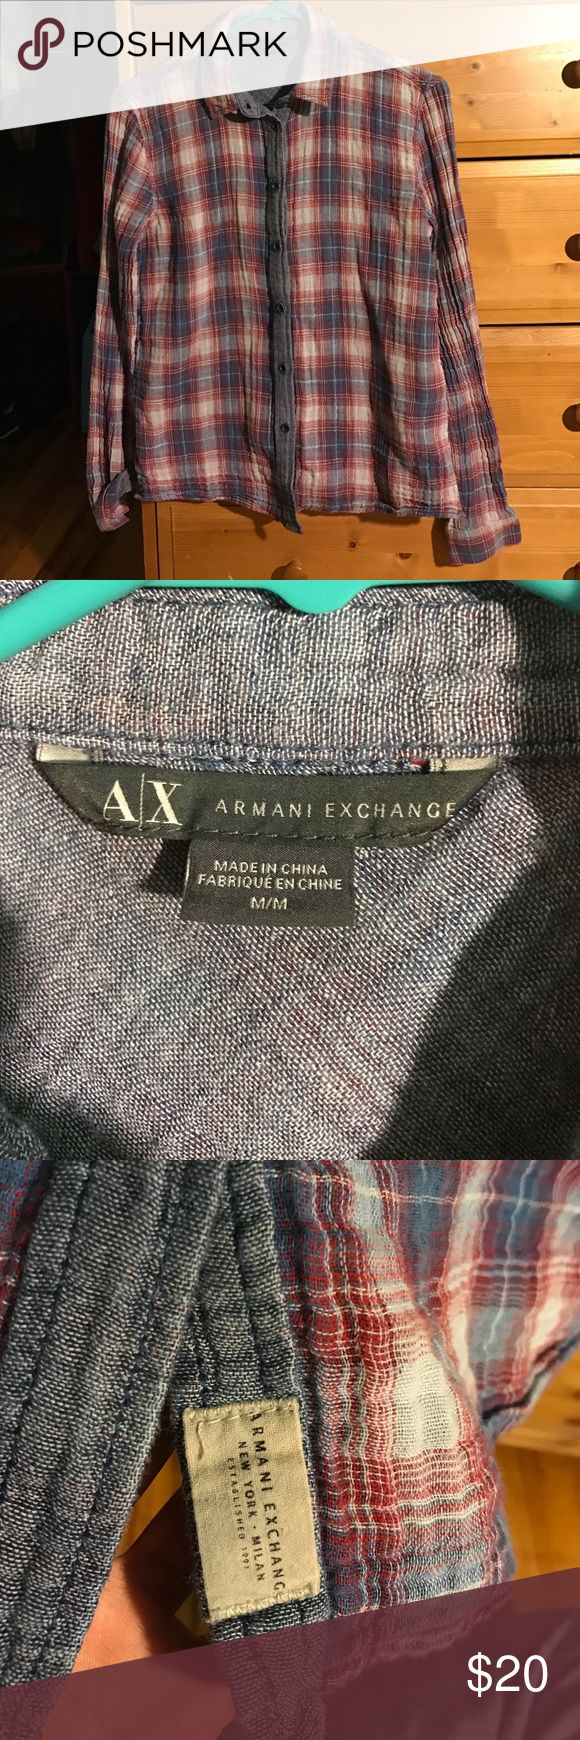 Armani Exchange Plaid Shirt 100% cotton plaid shirt. Denim like pattern inseam, which can be shown when cuffed. Fits small or medium. A/X Armani Exchange Tops Button Down Shirts